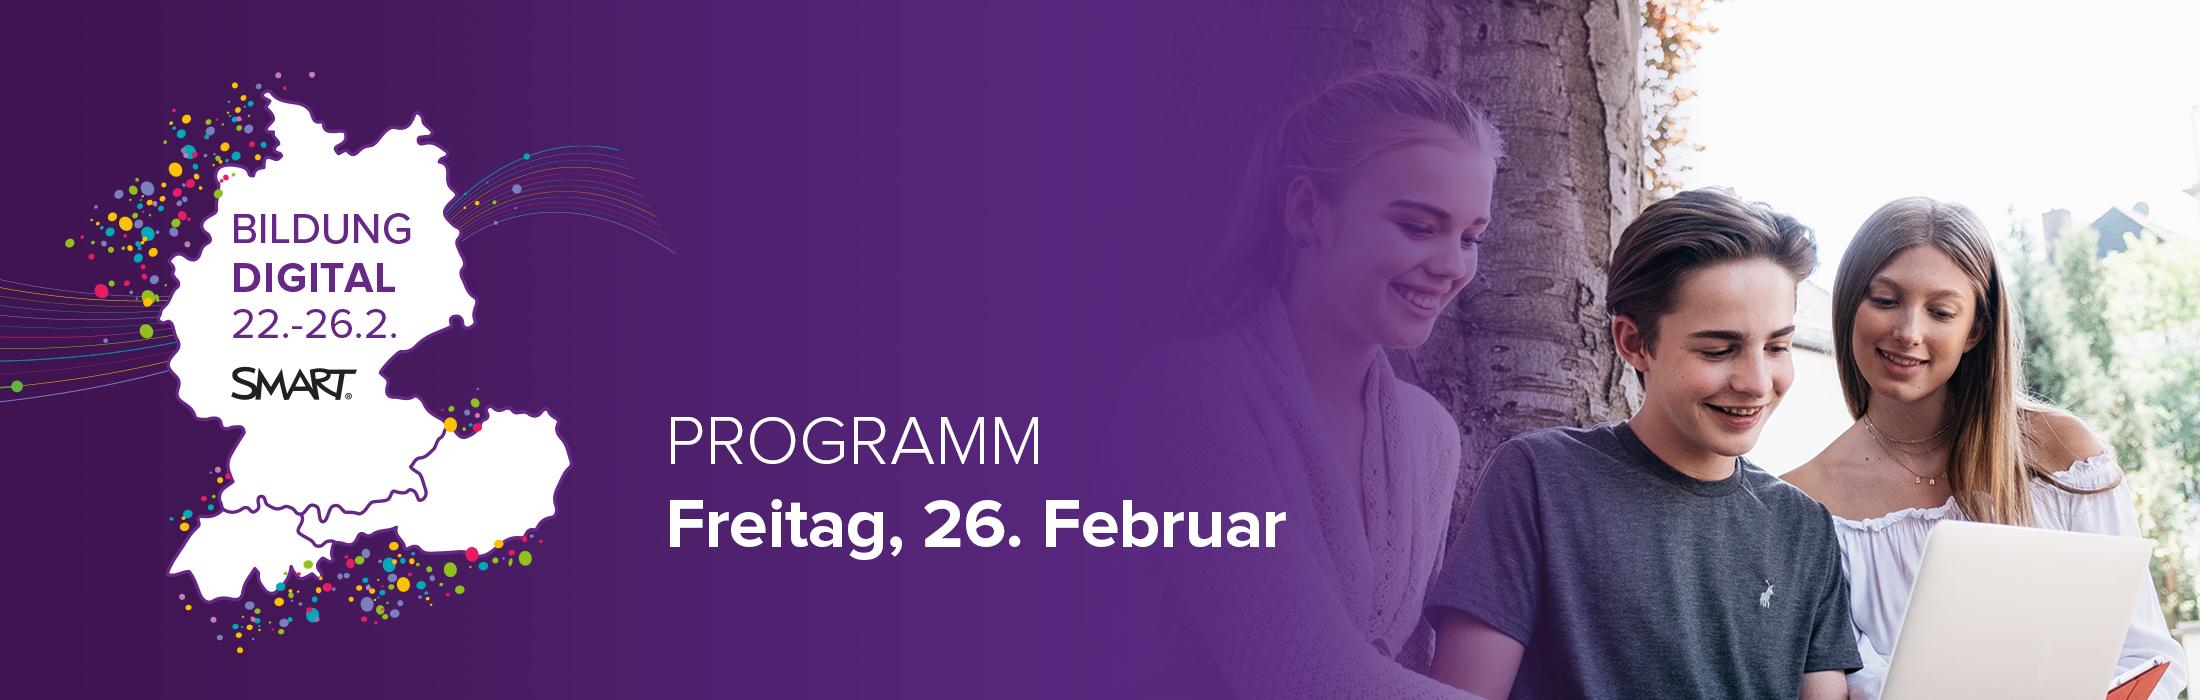 DACH-BD_Header-Programm-Fr_VS2